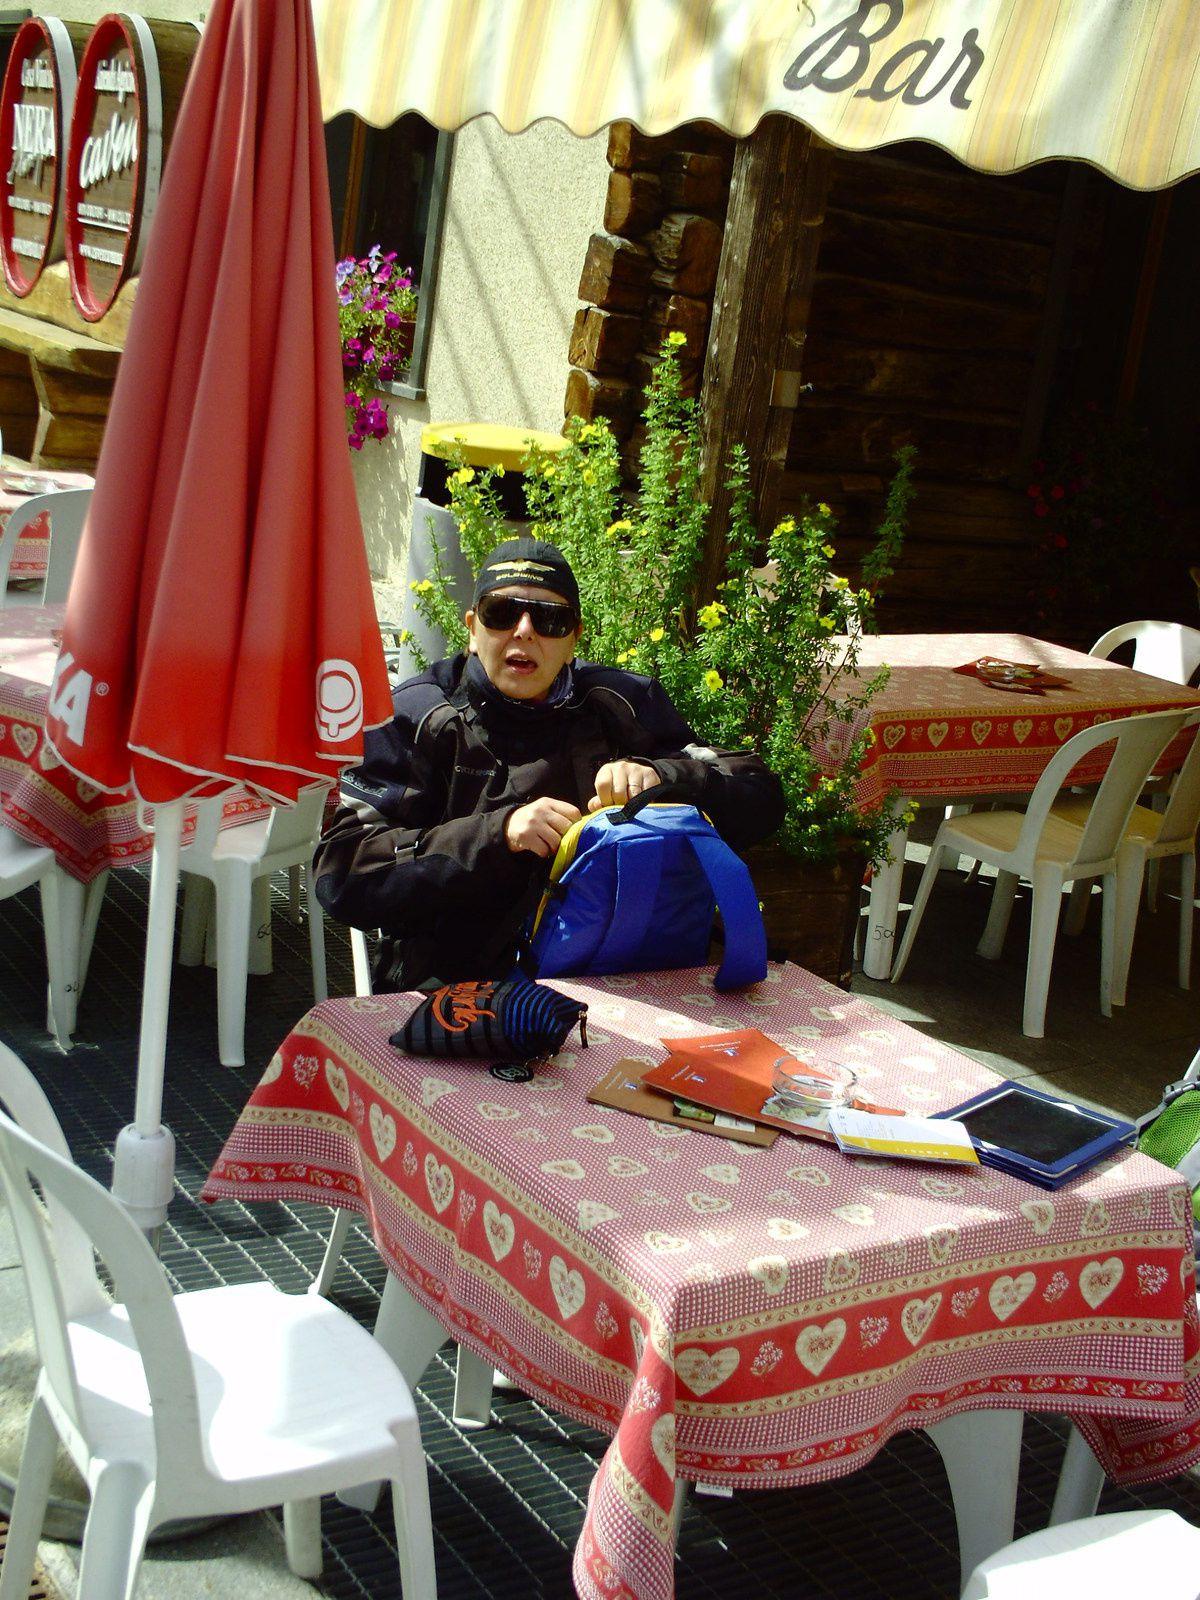 PETITE PIZZA.....TARIF INVRAISEMBLABLE.........